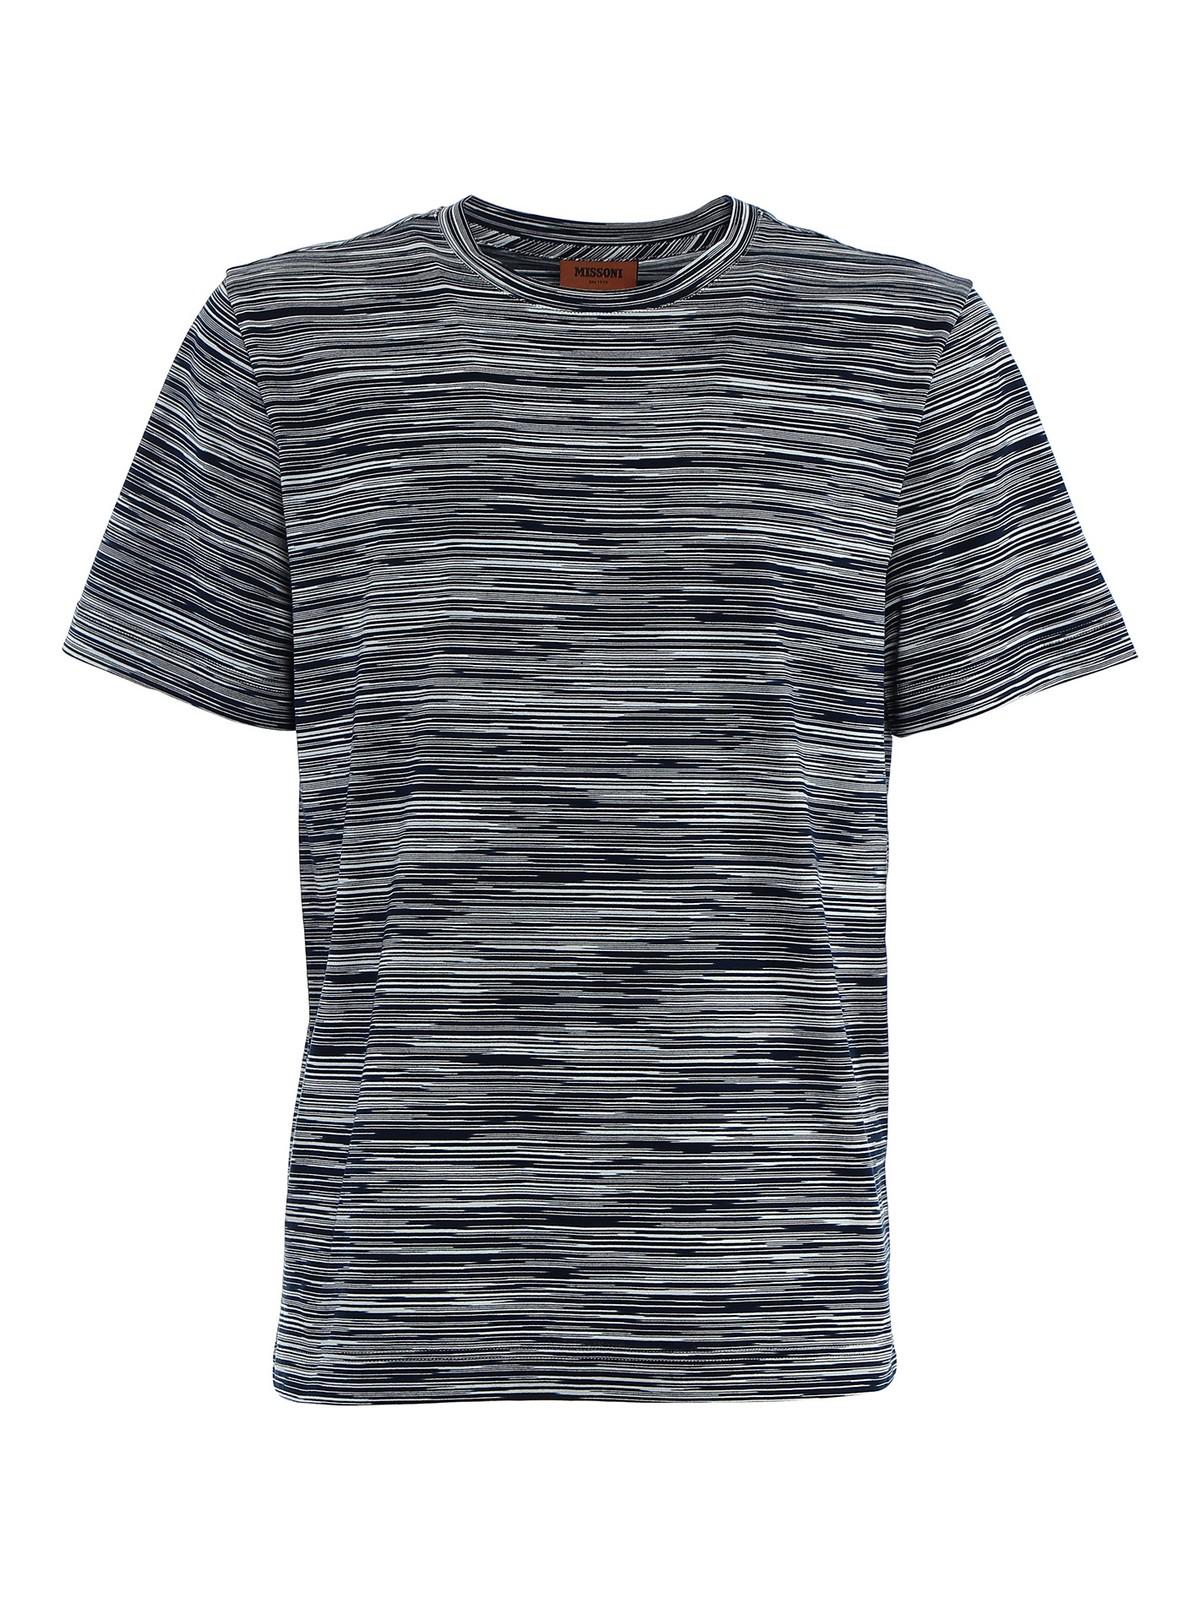 Missoni T-shirts COTTON T-SHIRT